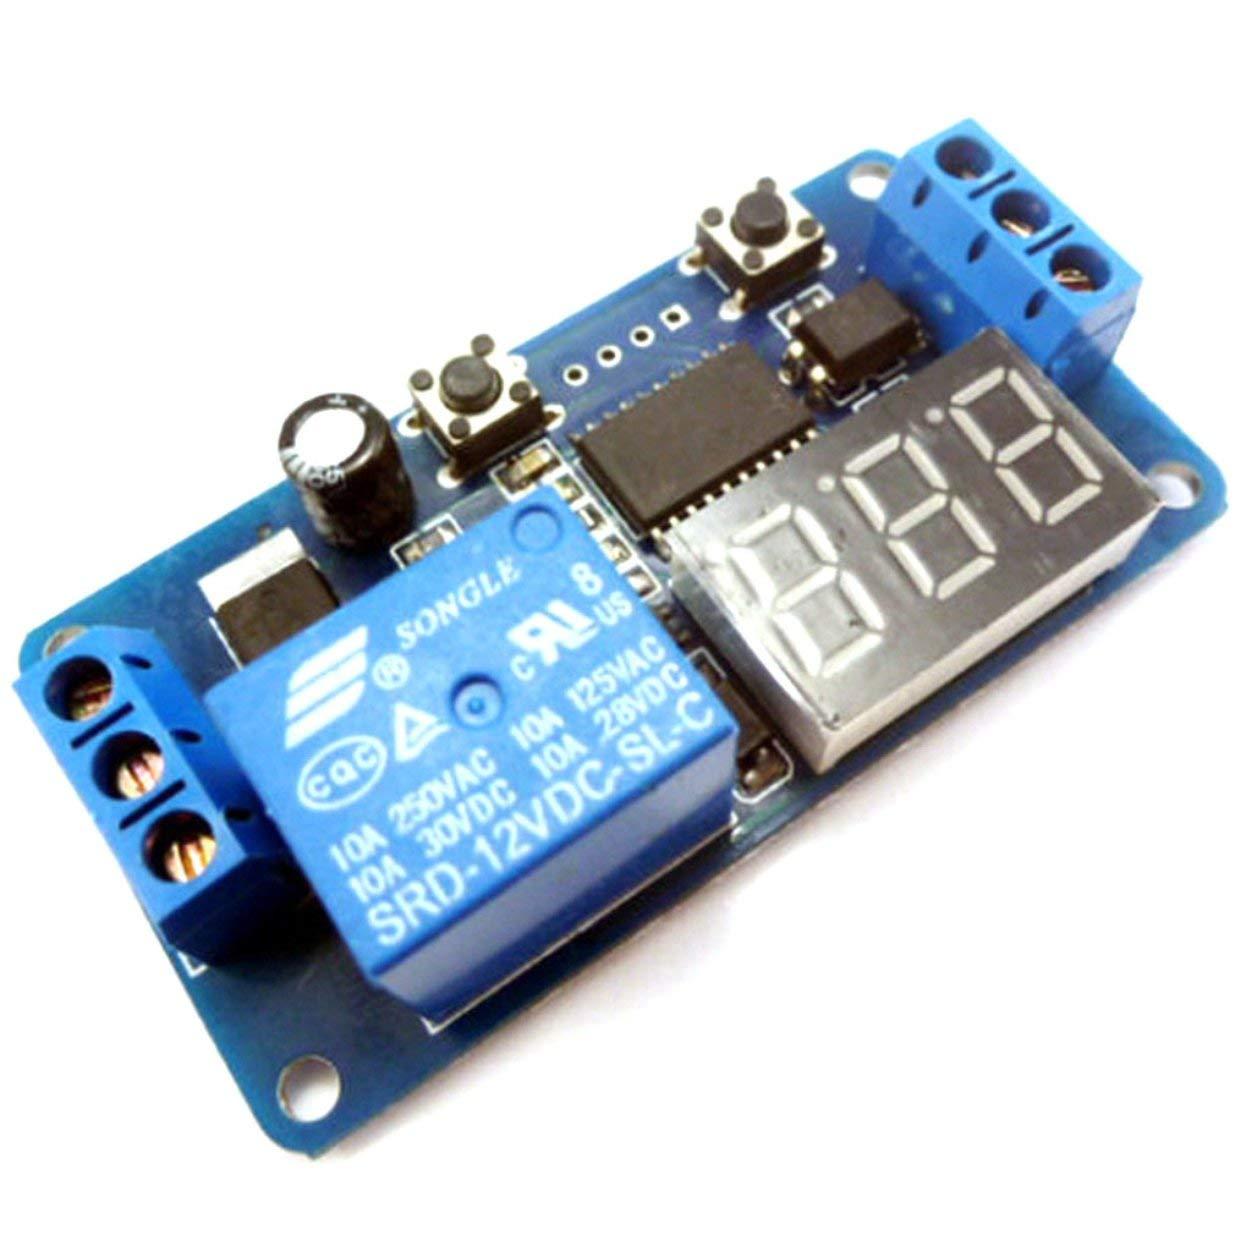 Banbie8409 Automatización del PLC del módulo del Interruptor de Control del Temporizador de retardo Digital de la Pantalla LED DC 12V-Azul Negro